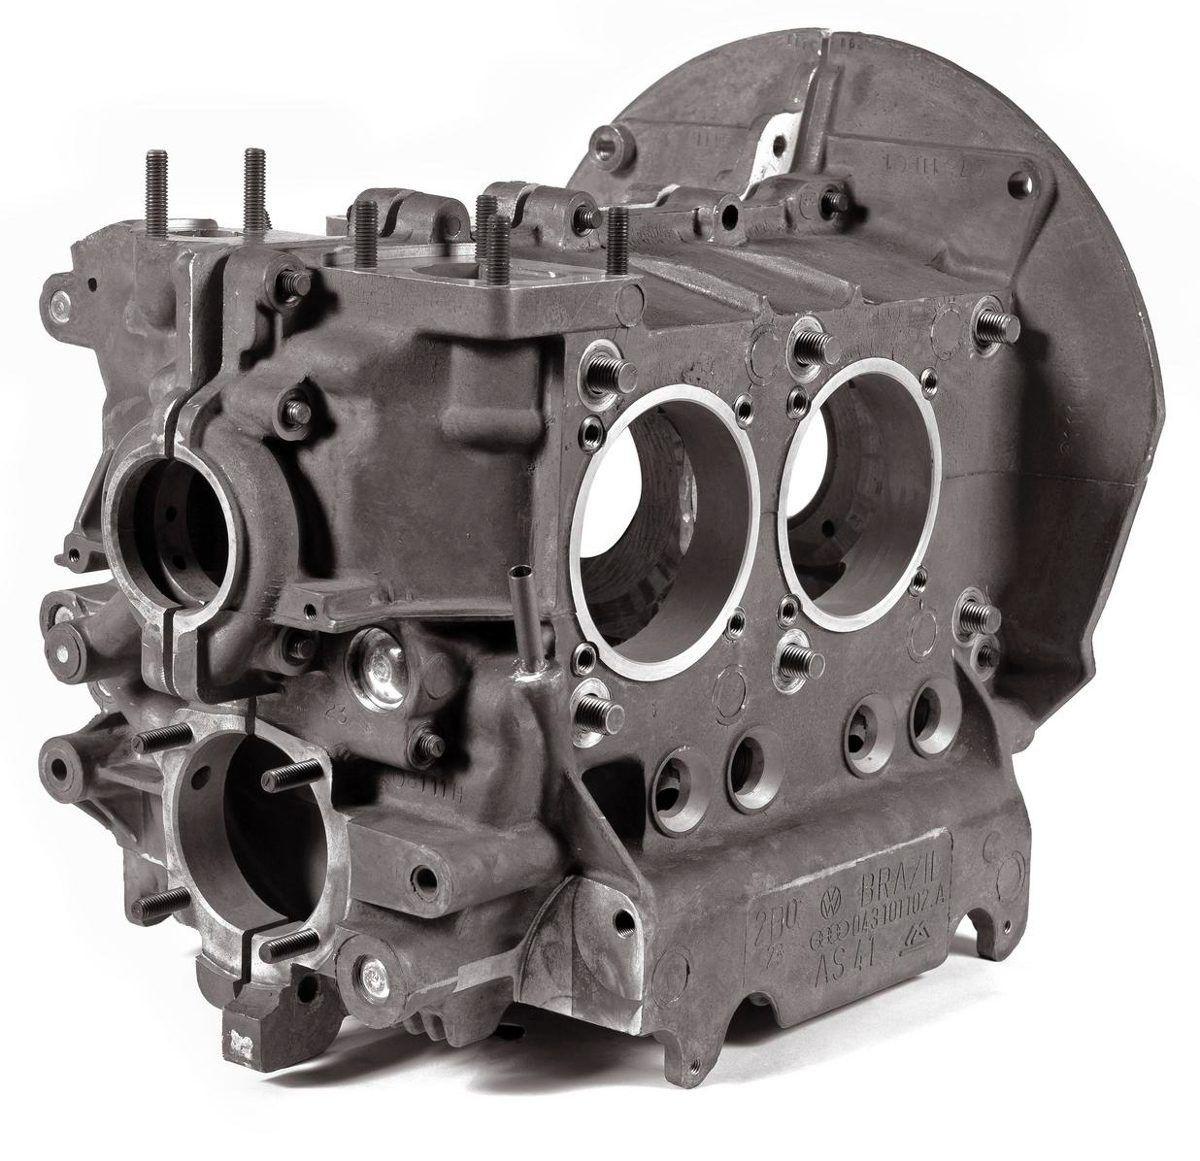 Bloco Motor De Kombi Fusca 1600 A Ar Genuína Vw